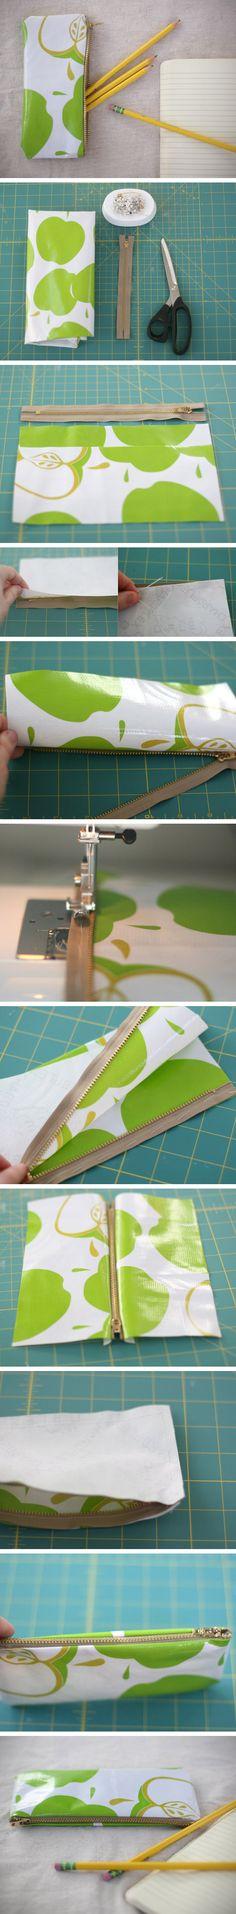 Handbag Tutorial, Diy Handbag, Cool Diy Projects, Sewing Projects, Costura Diy, Educational Crafts, Sewing Stitches, Waterproof Fabric, Crafty Craft